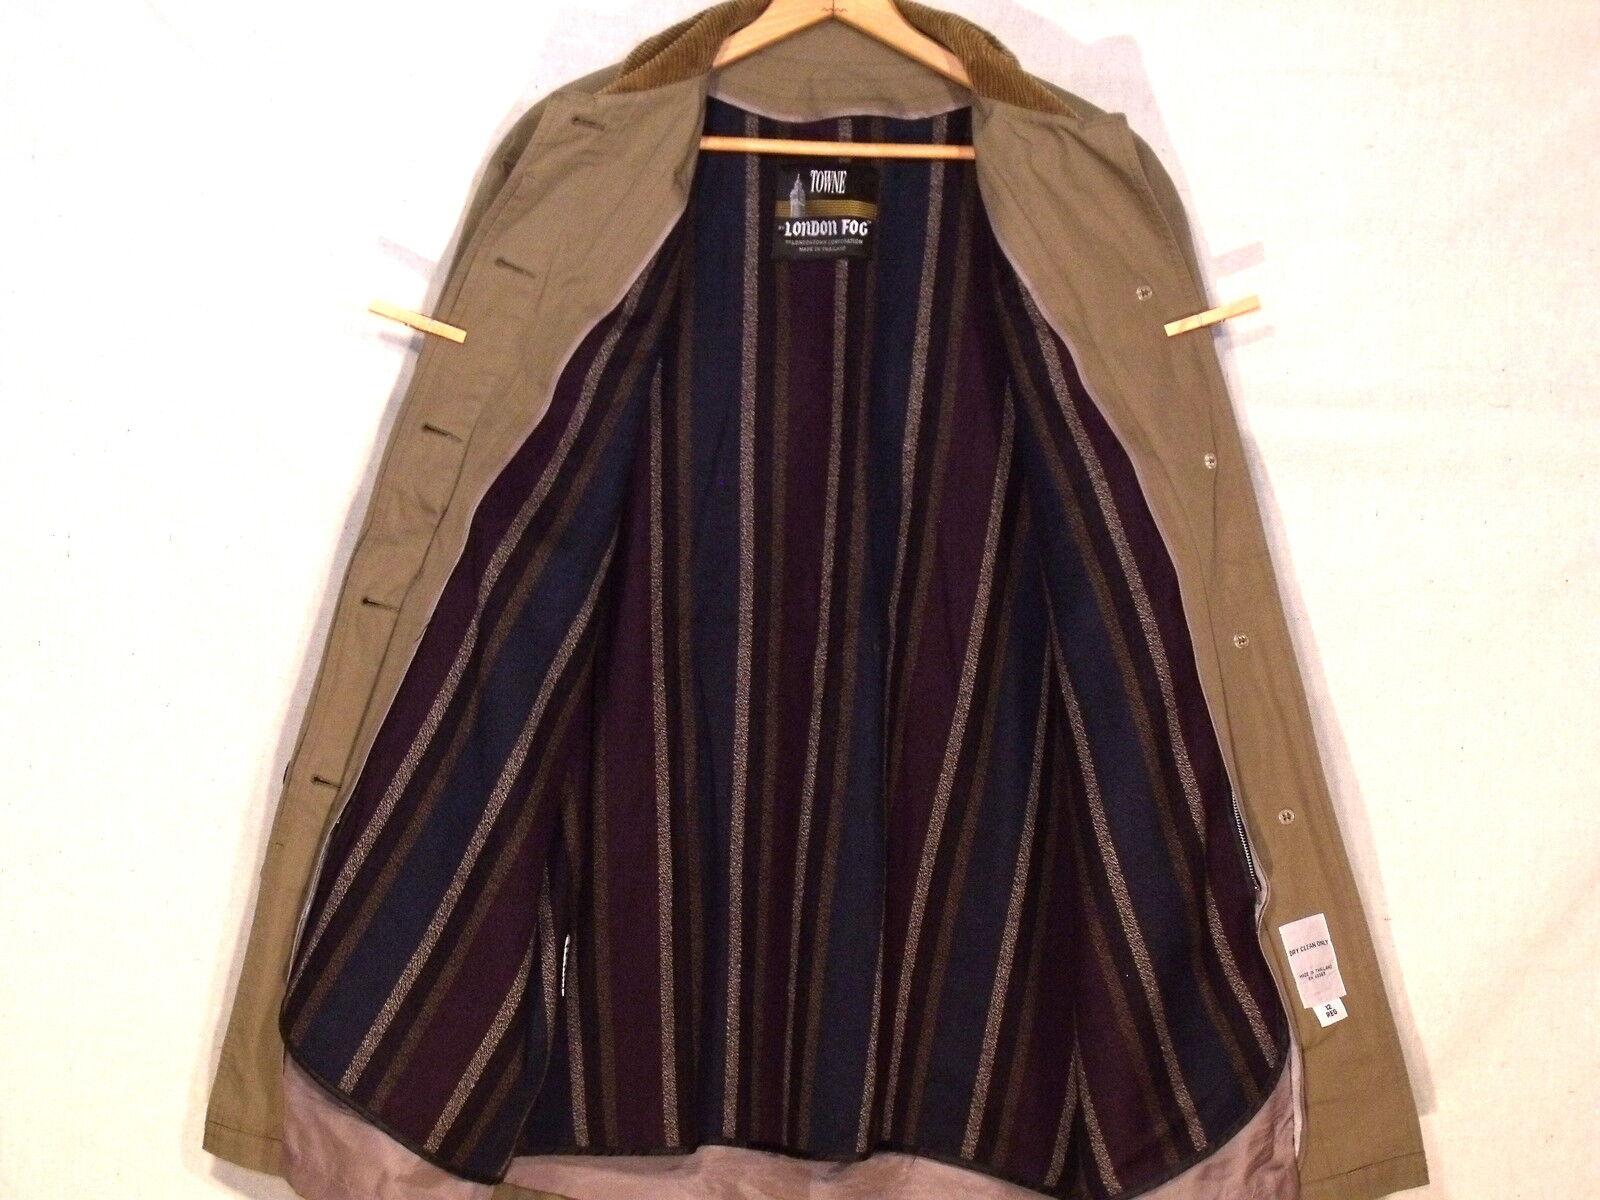 London Fog Fog Fog Towne VTG mid length lined taupe button coat   size 12R   great  b23 c2b0ab